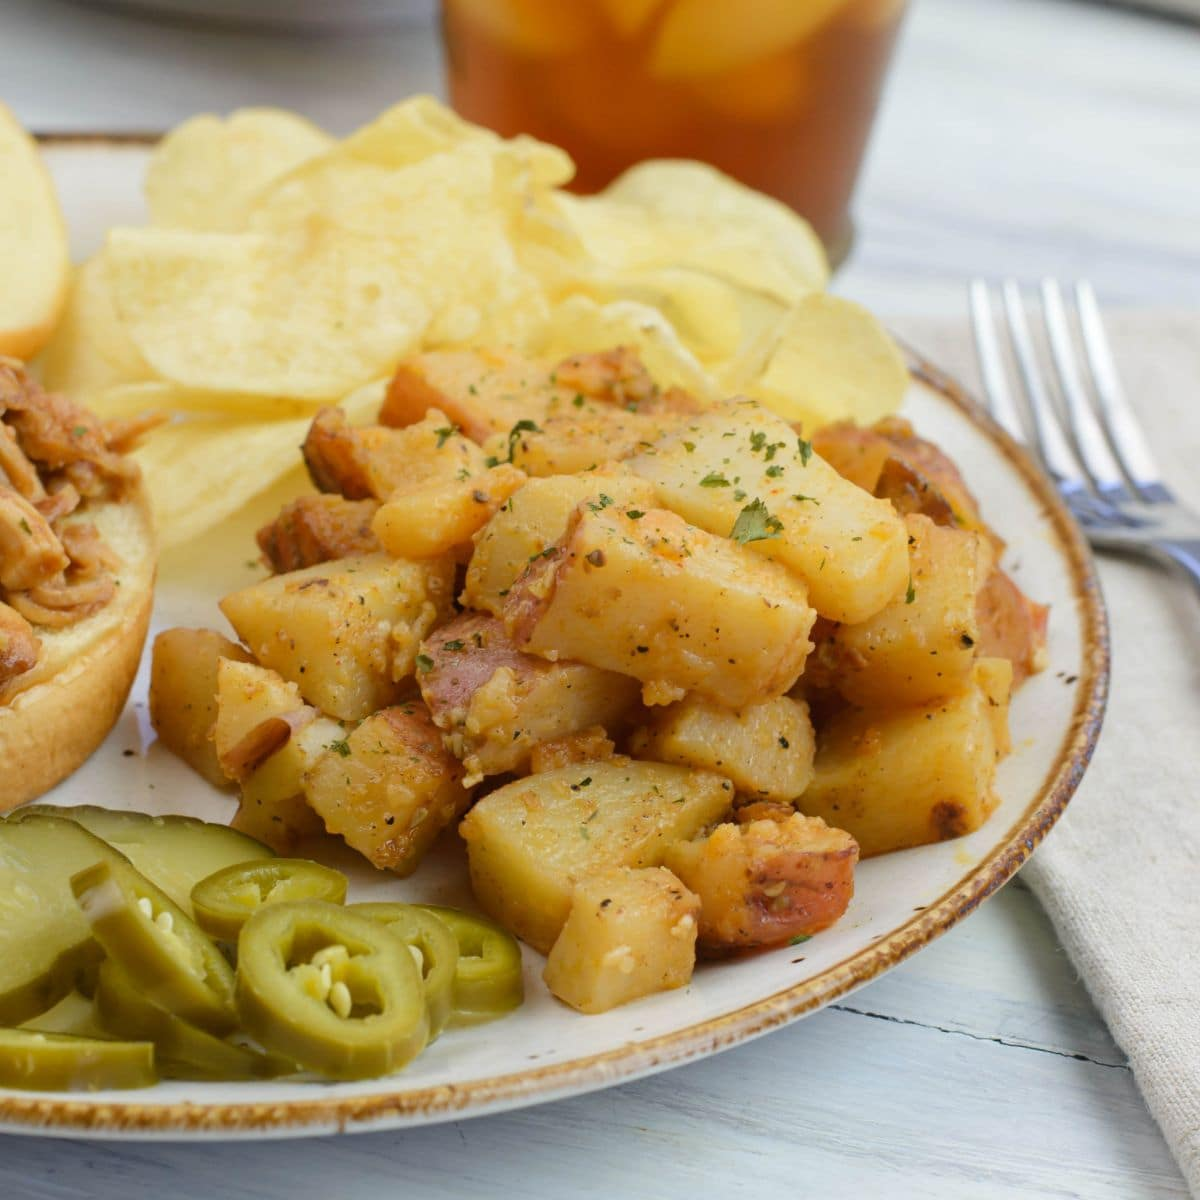 Closeup of a serving of garlic potatoes on a dinner plate.